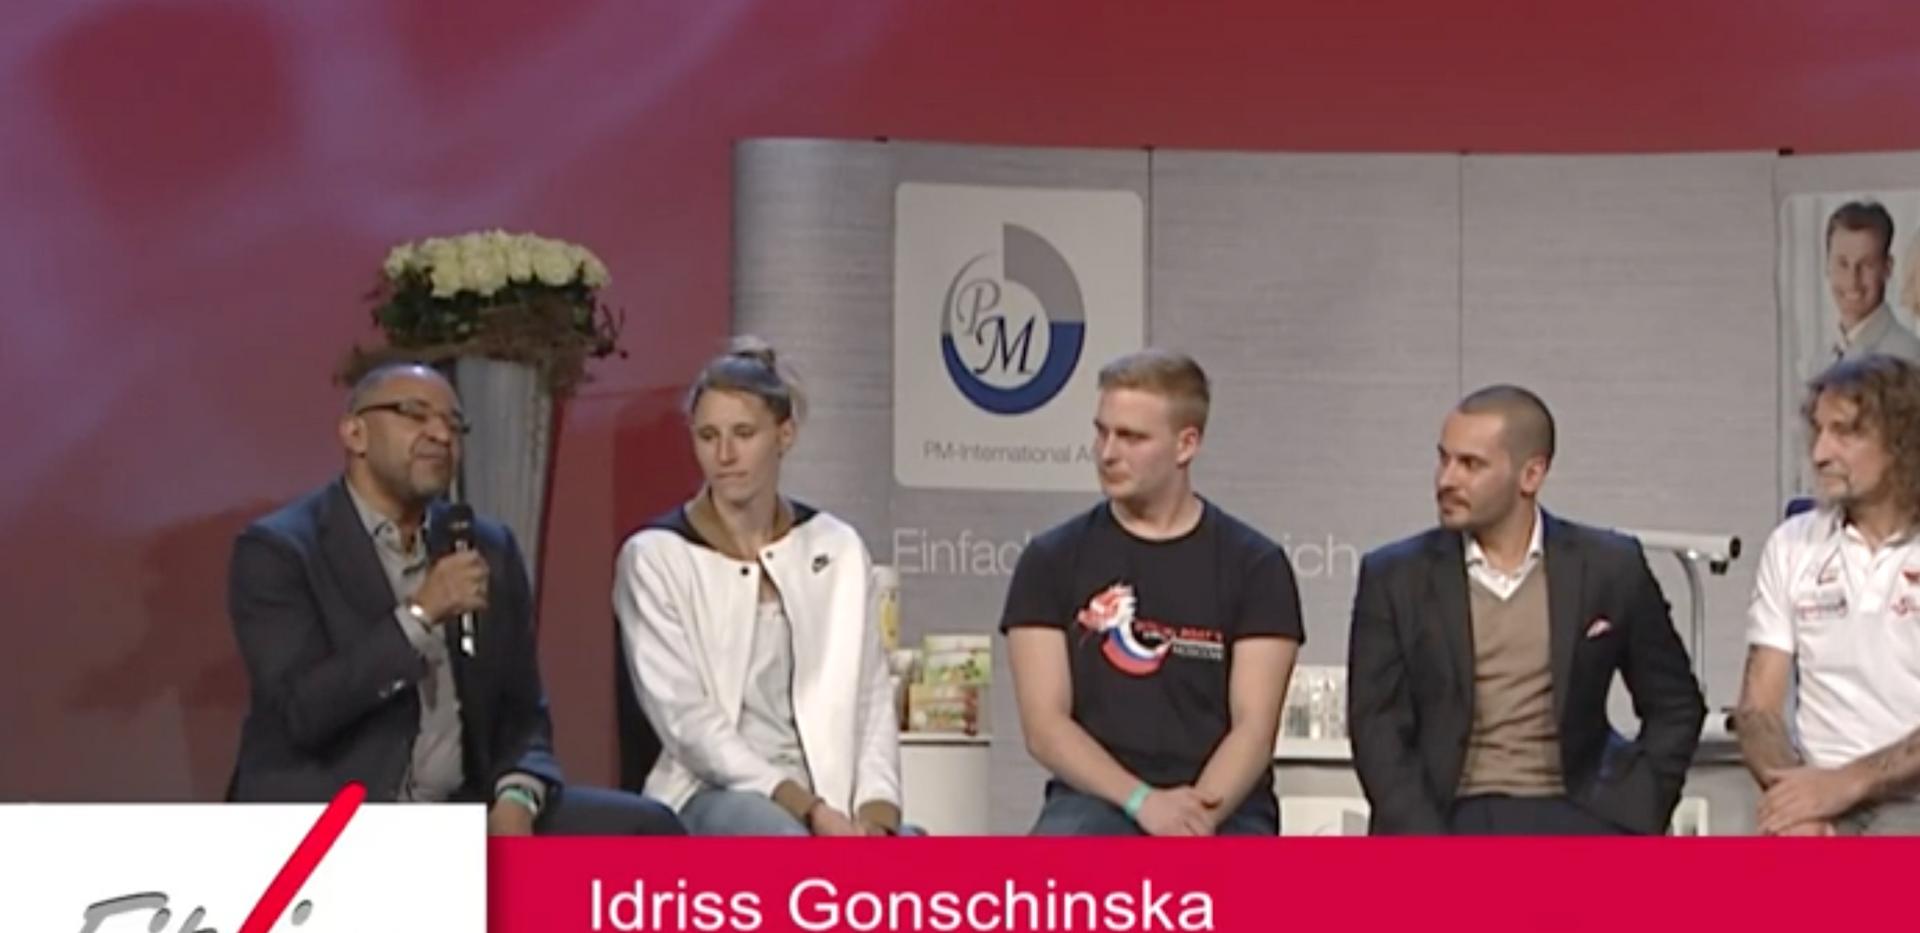 DLV - Idriss Gonschinska